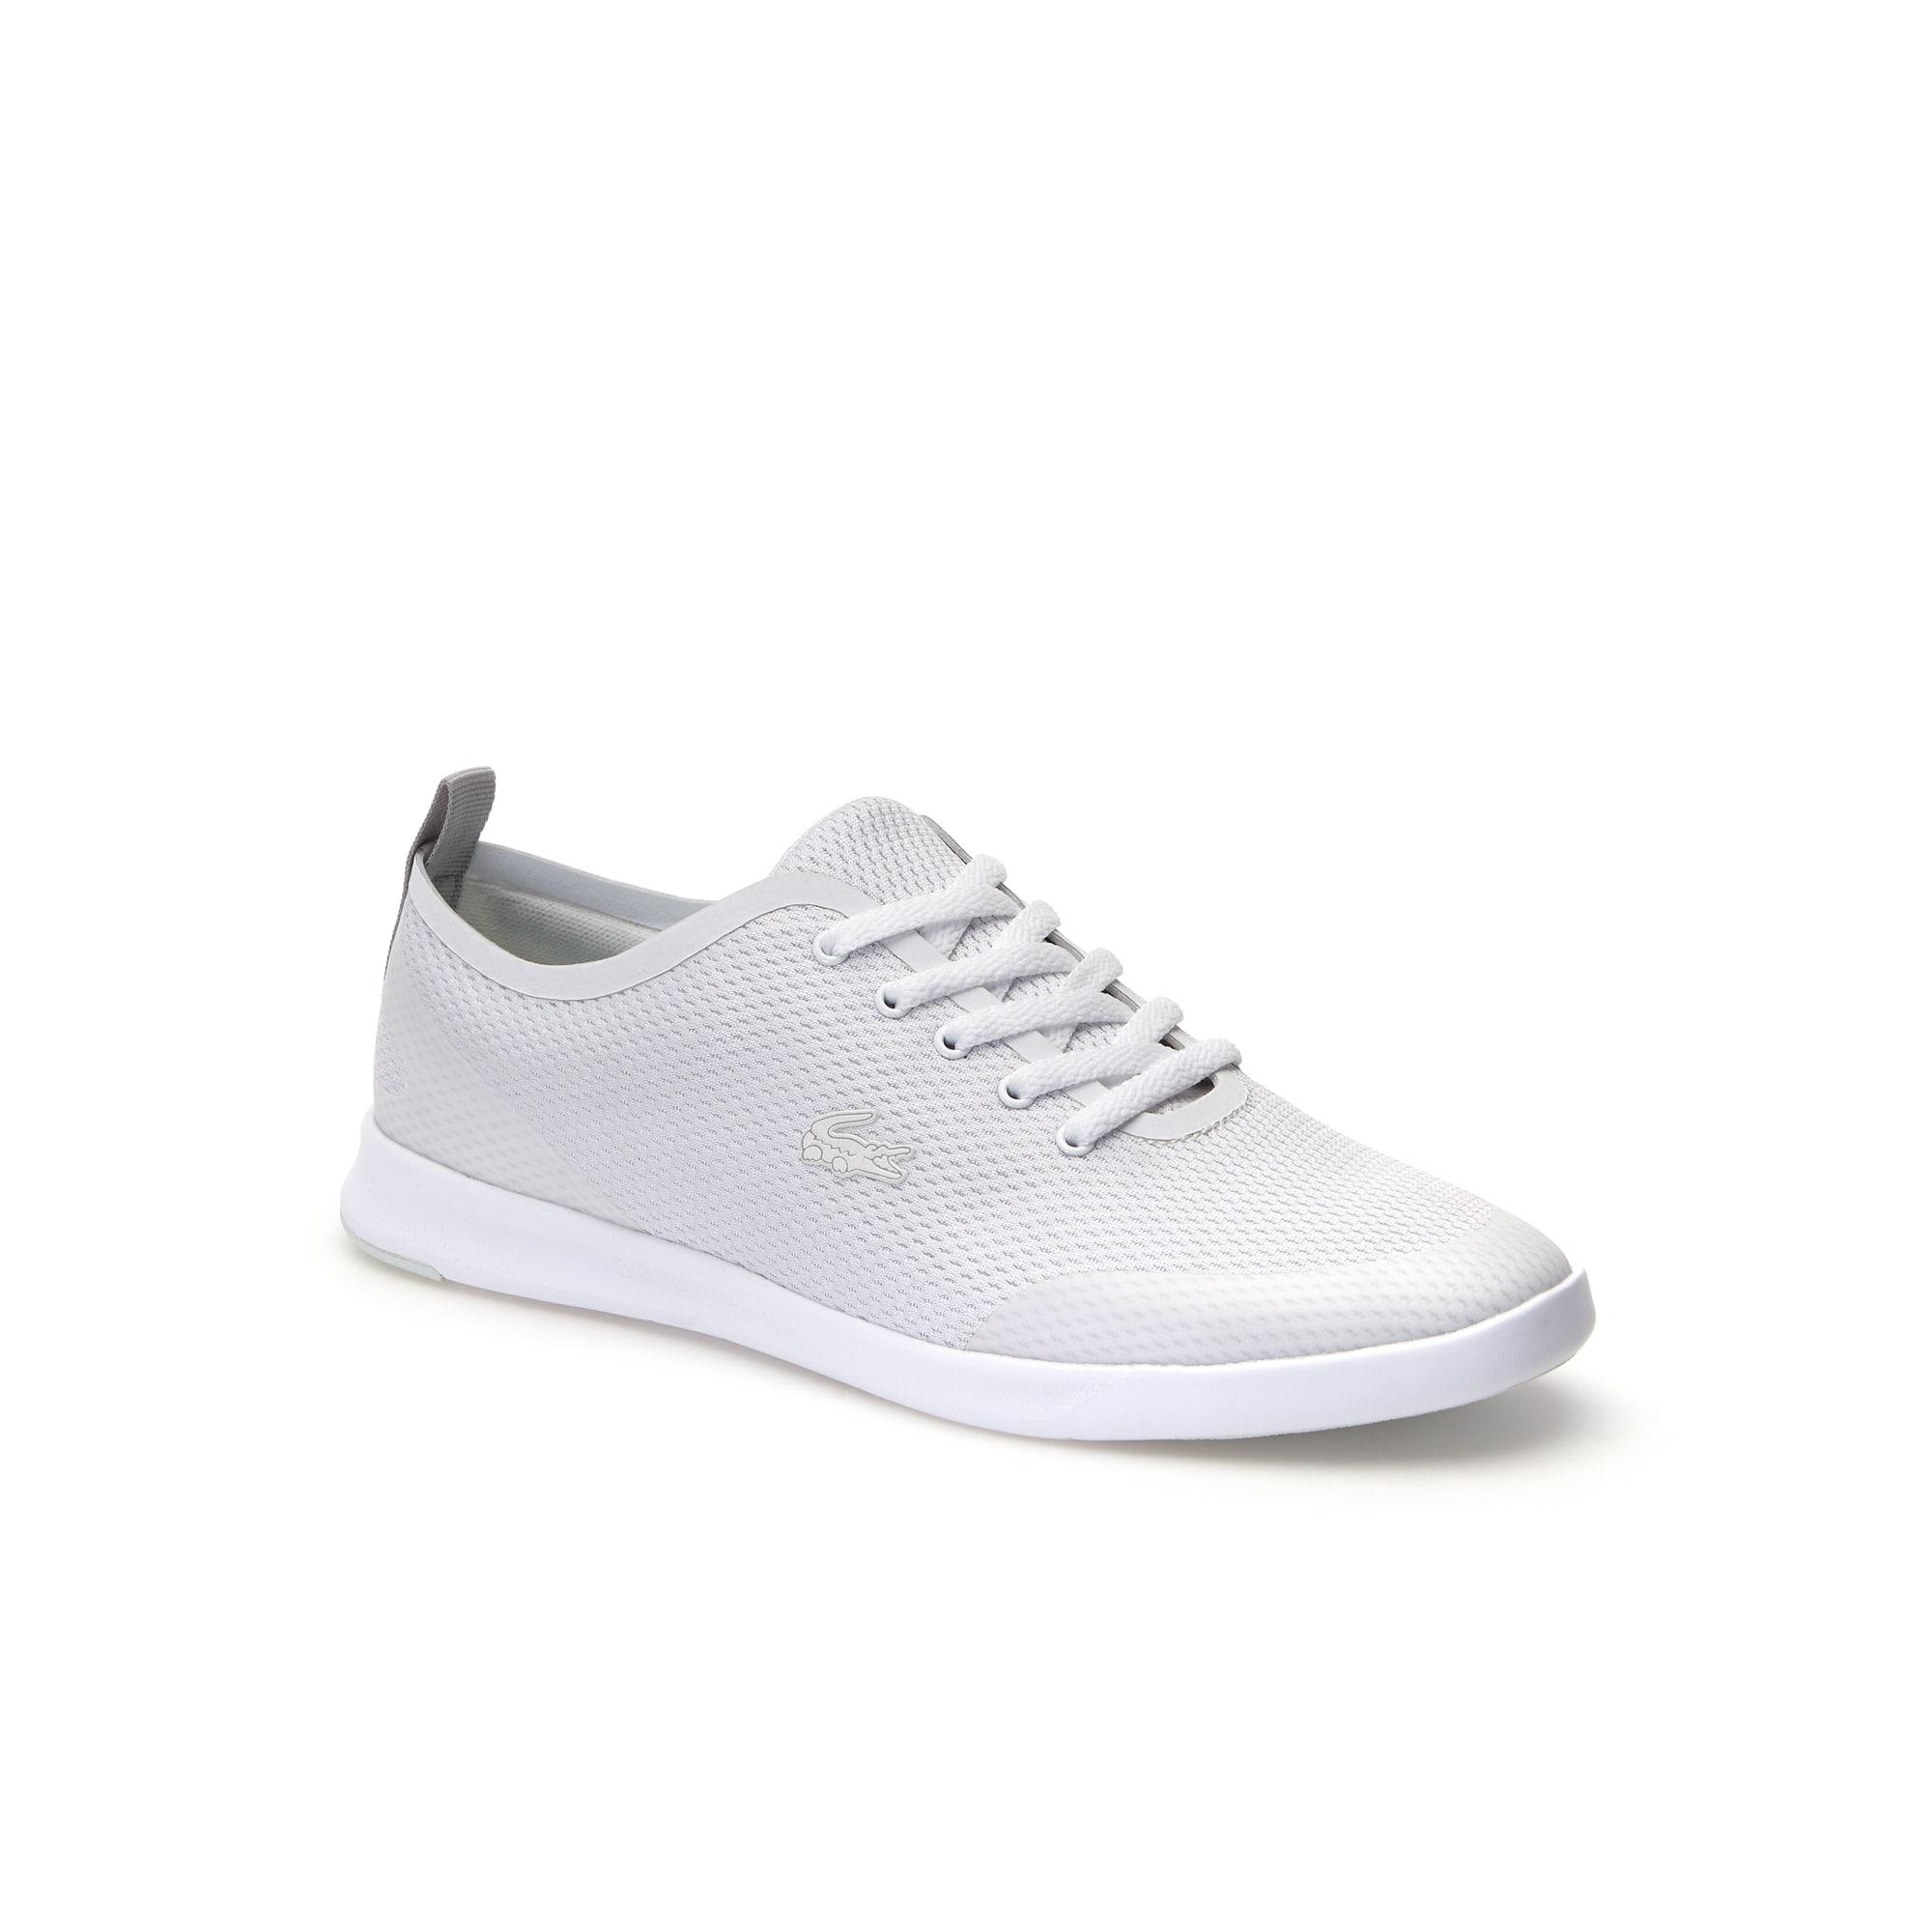 Sneakers Avenir in tessuto